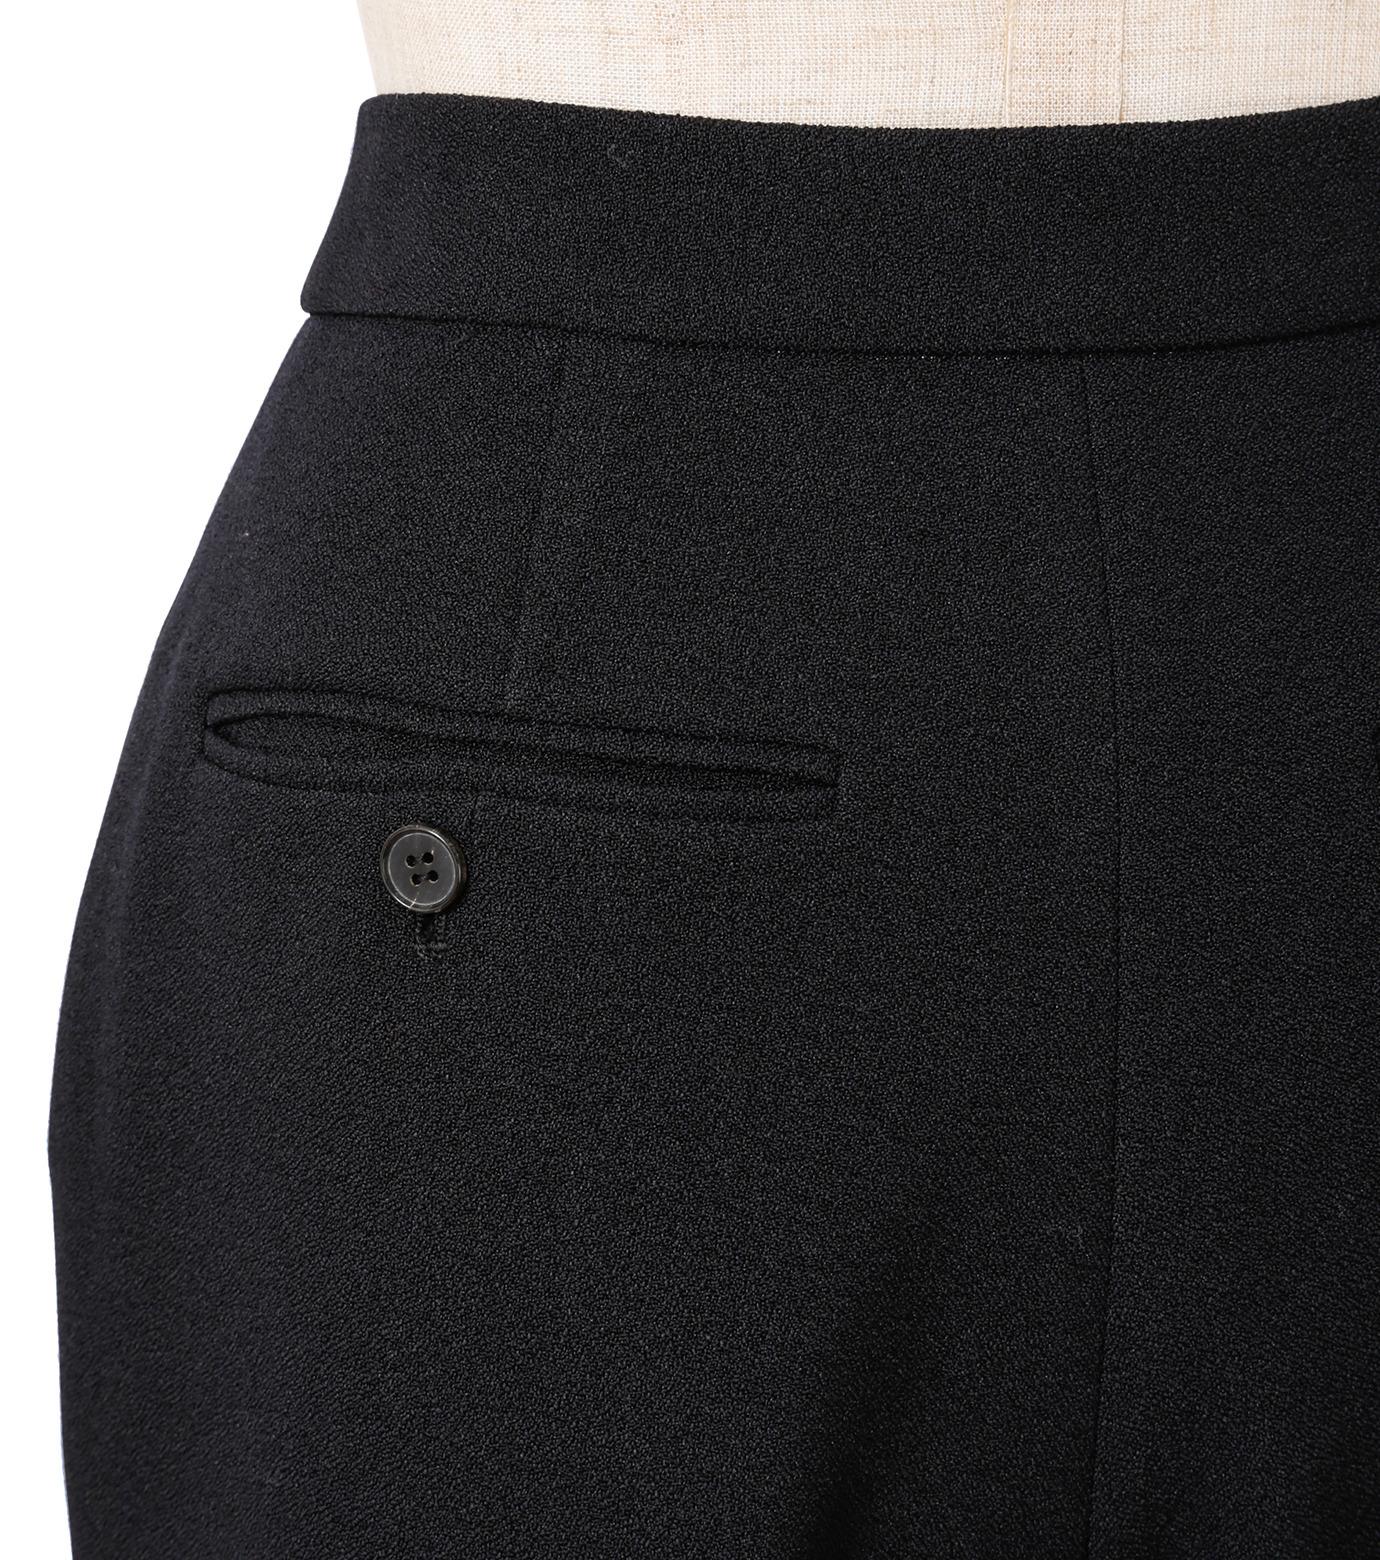 IRENE(アイレネ)のトランペットトラウザー-BLACK(パンツ/pants)-18A88002 拡大詳細画像5